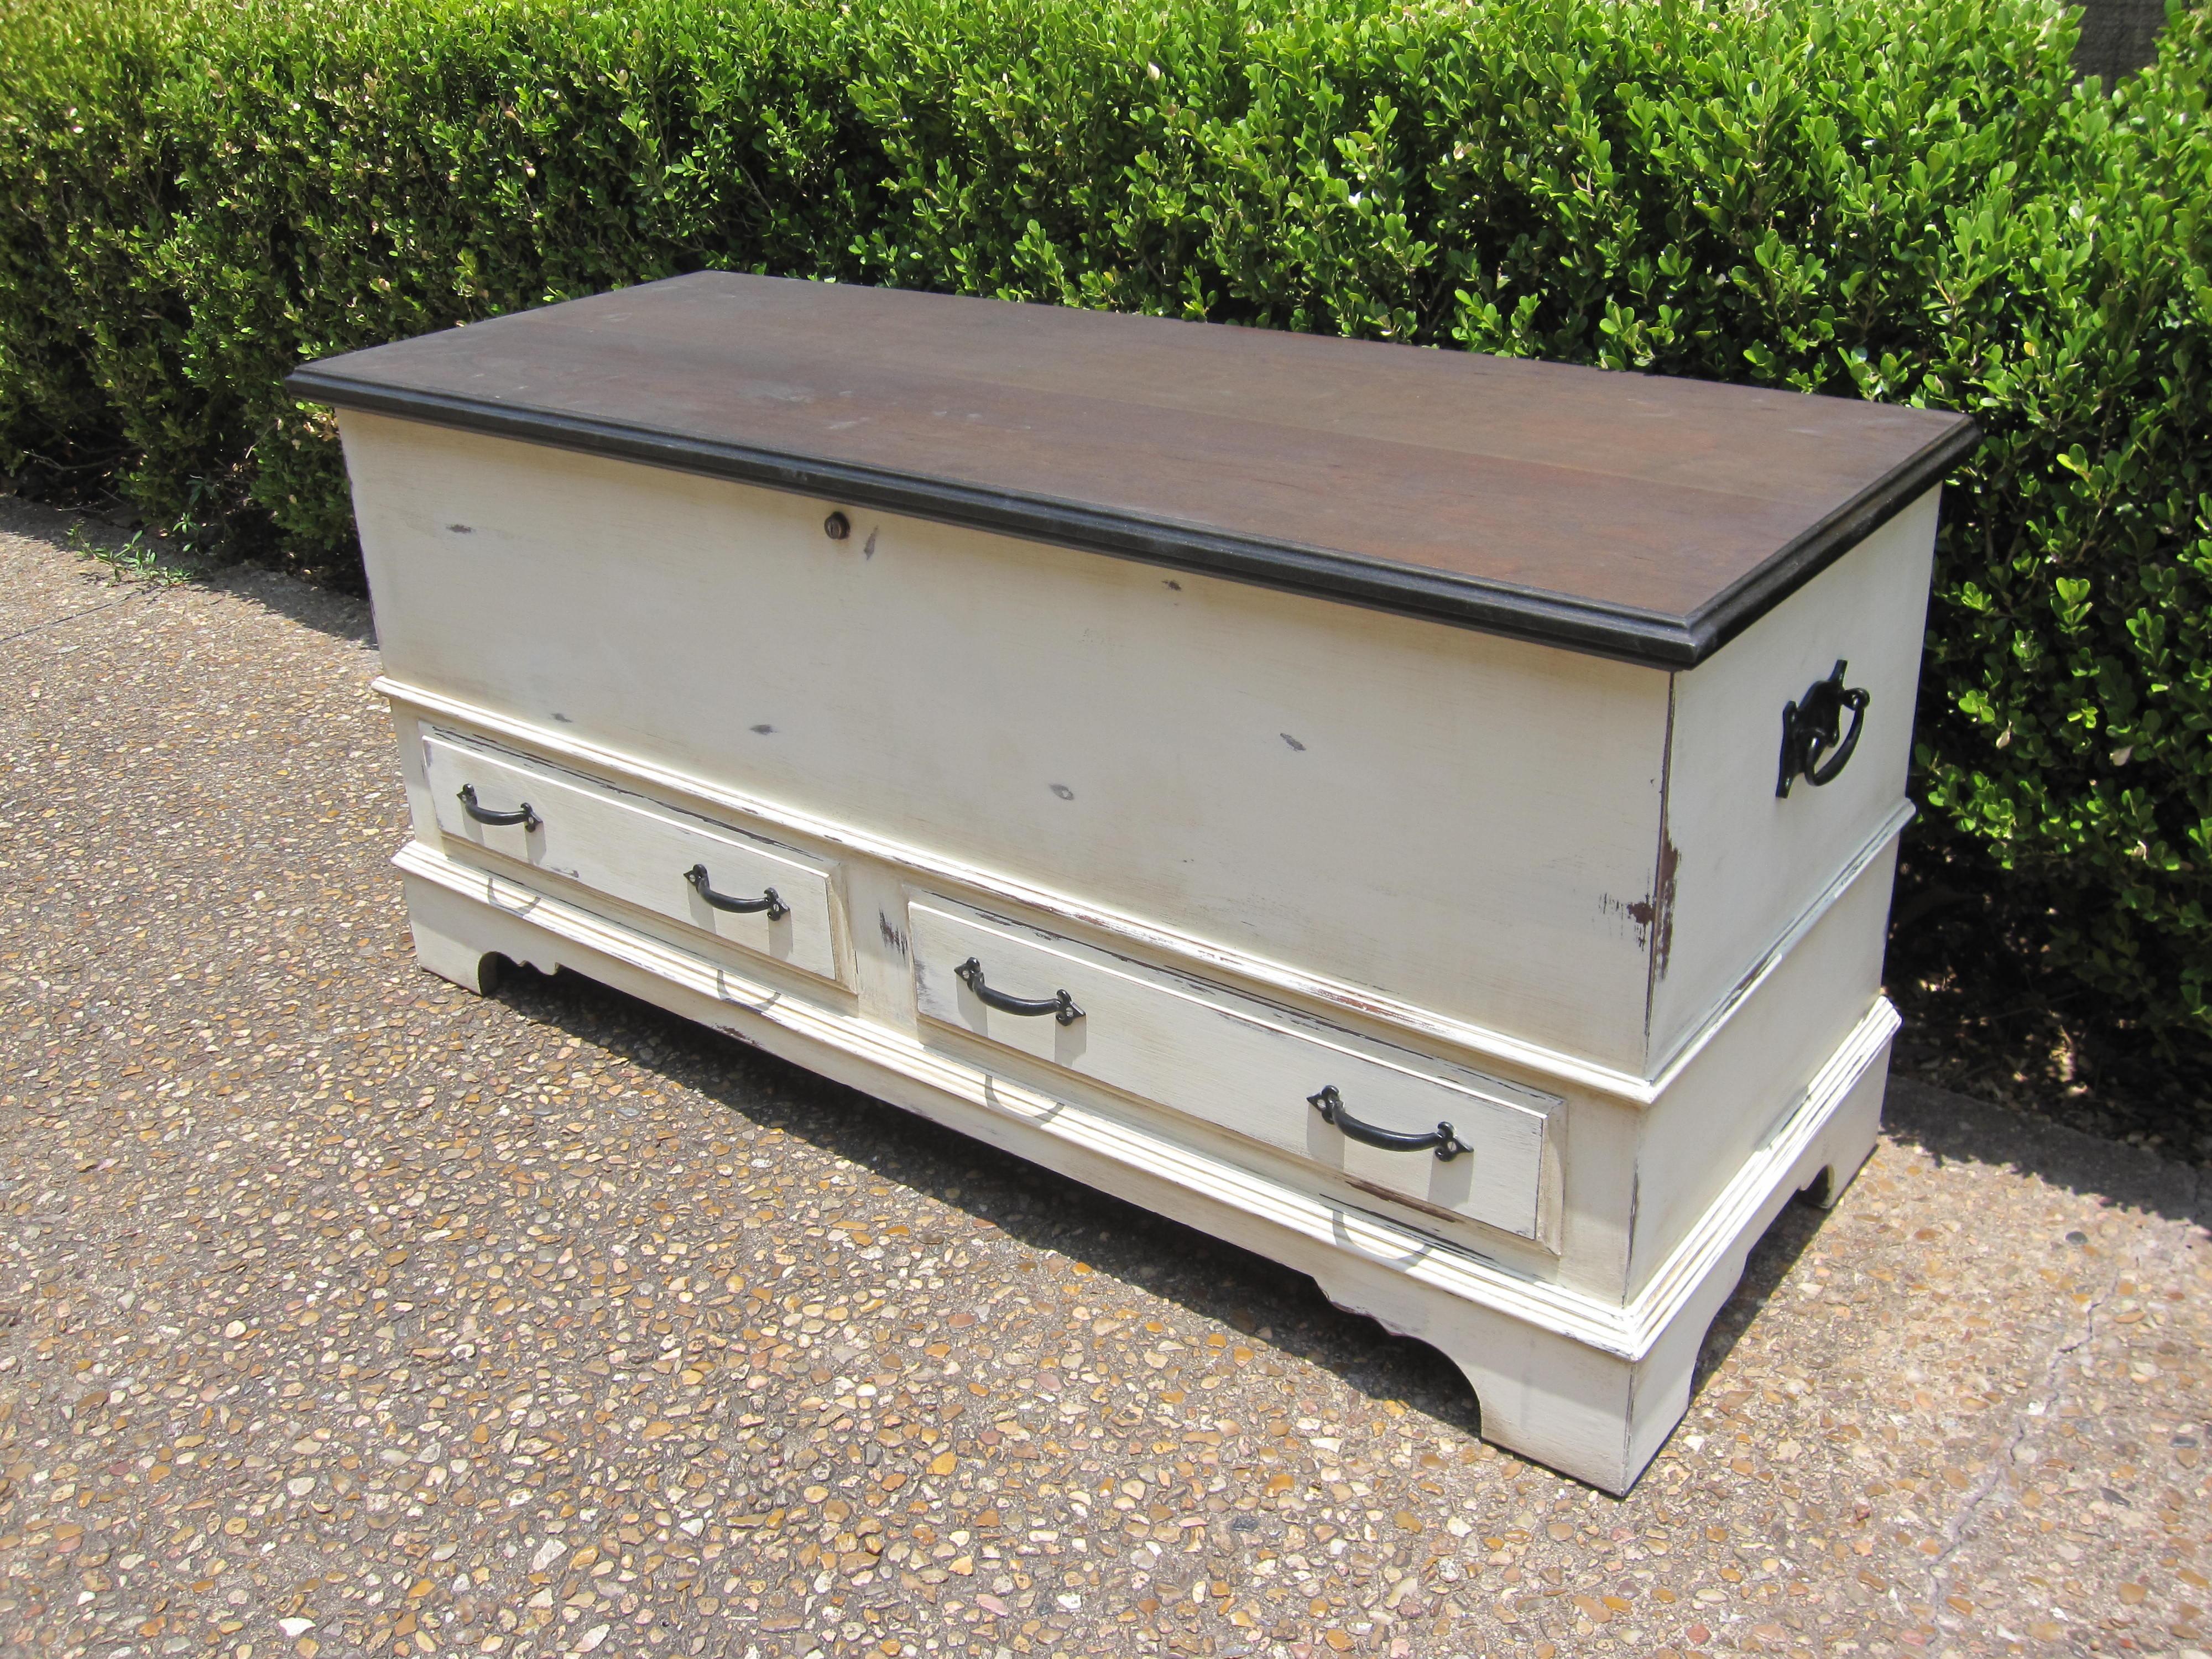 ethan allen dining room chairs massage chair walmart refinished lane cedar chest | houston furniture refinishing: lindauer designs